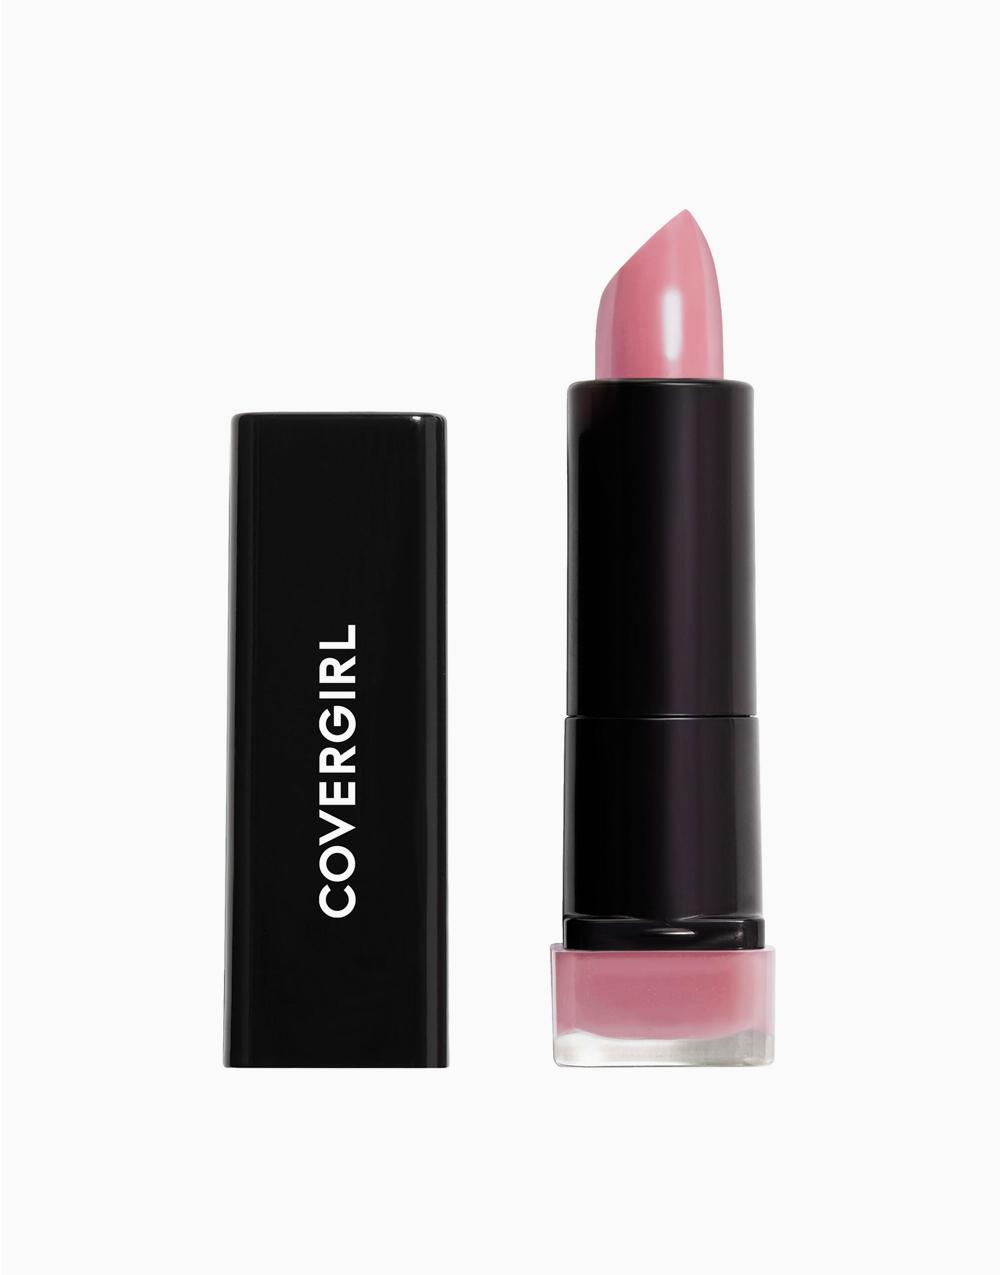 Exhibitionist Cream Lipstick by CoverGirl   Honeyed Bloom